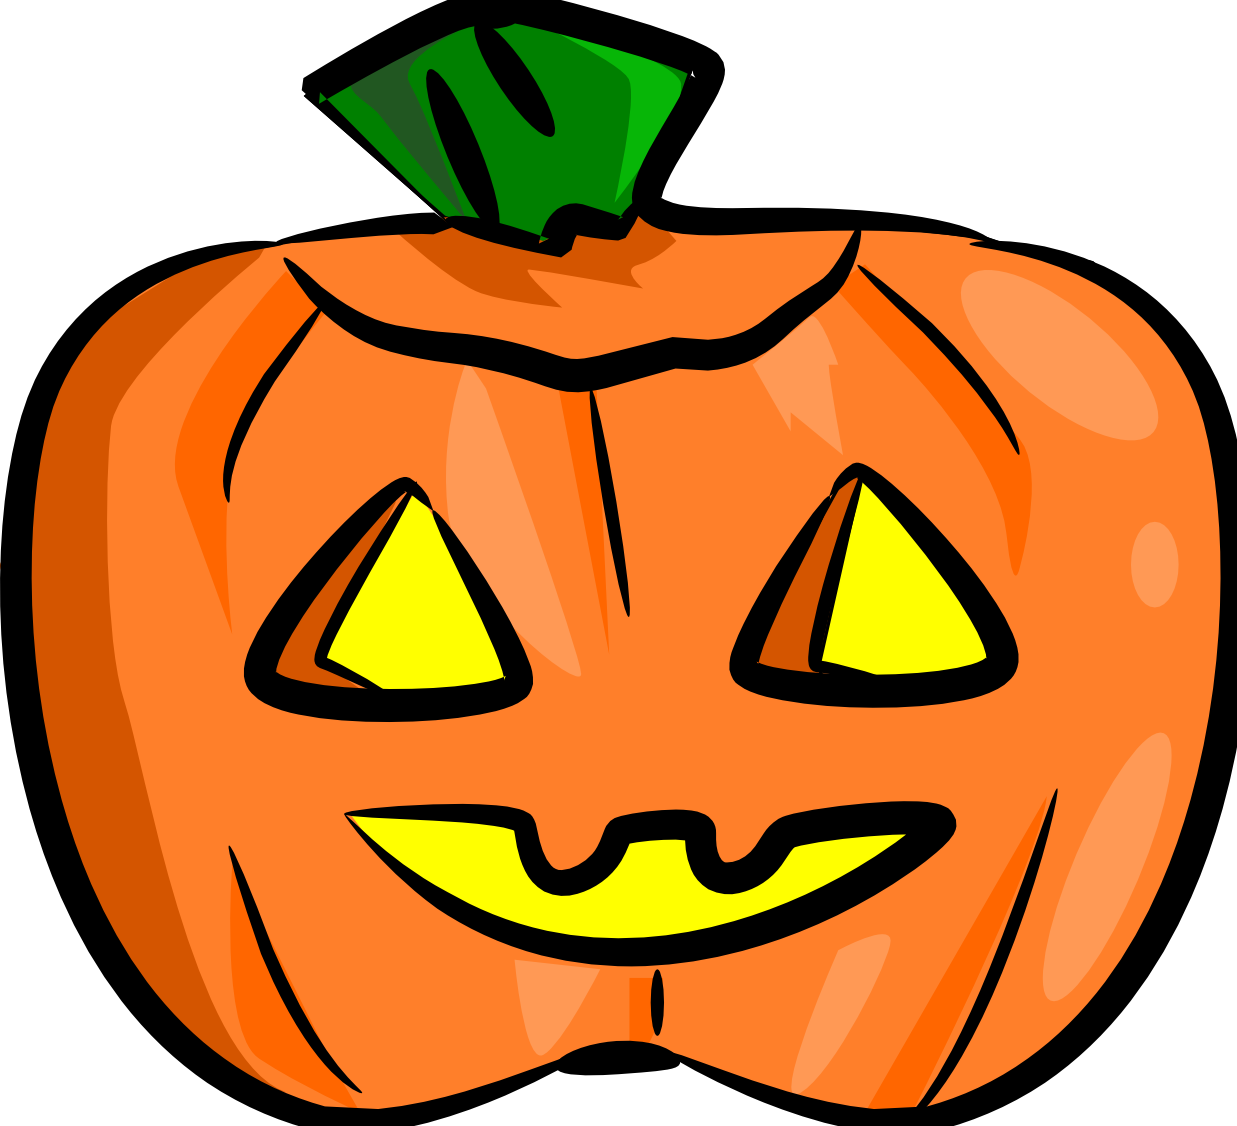 1237x1126 Cute Jack Lantern Clip Art Free Clipart Images